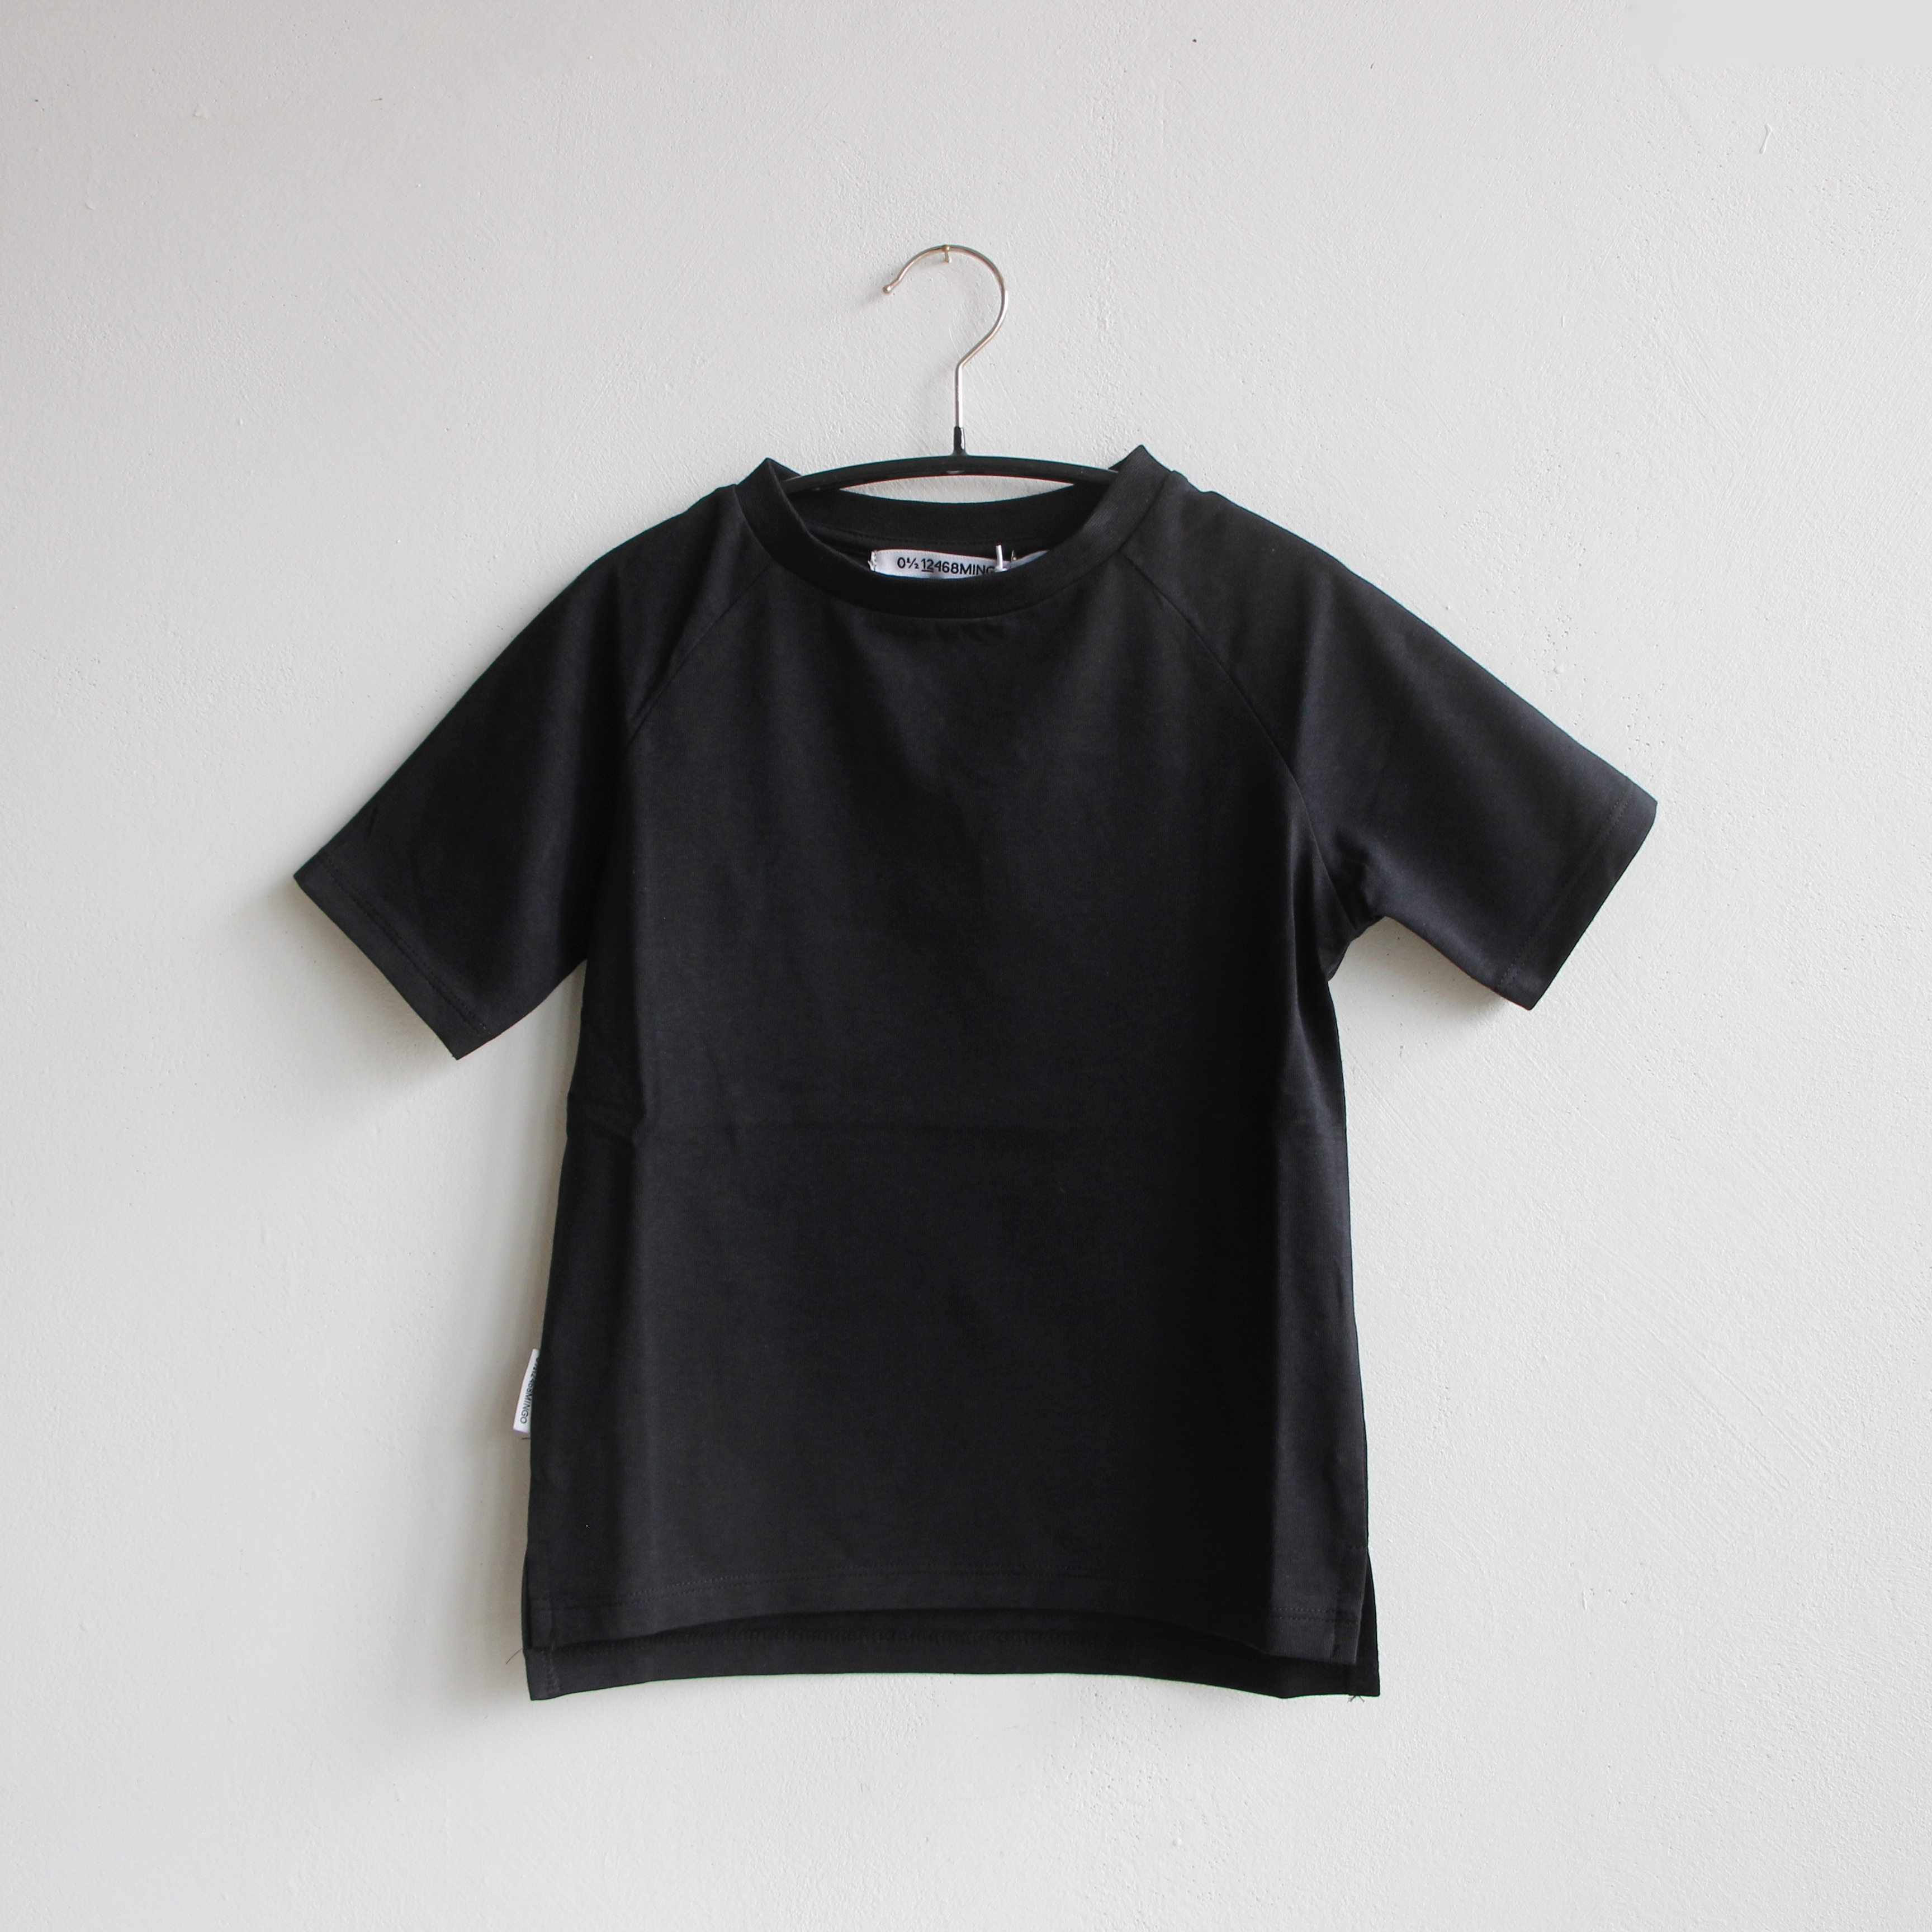 《MINGO.》T-shirt / Black